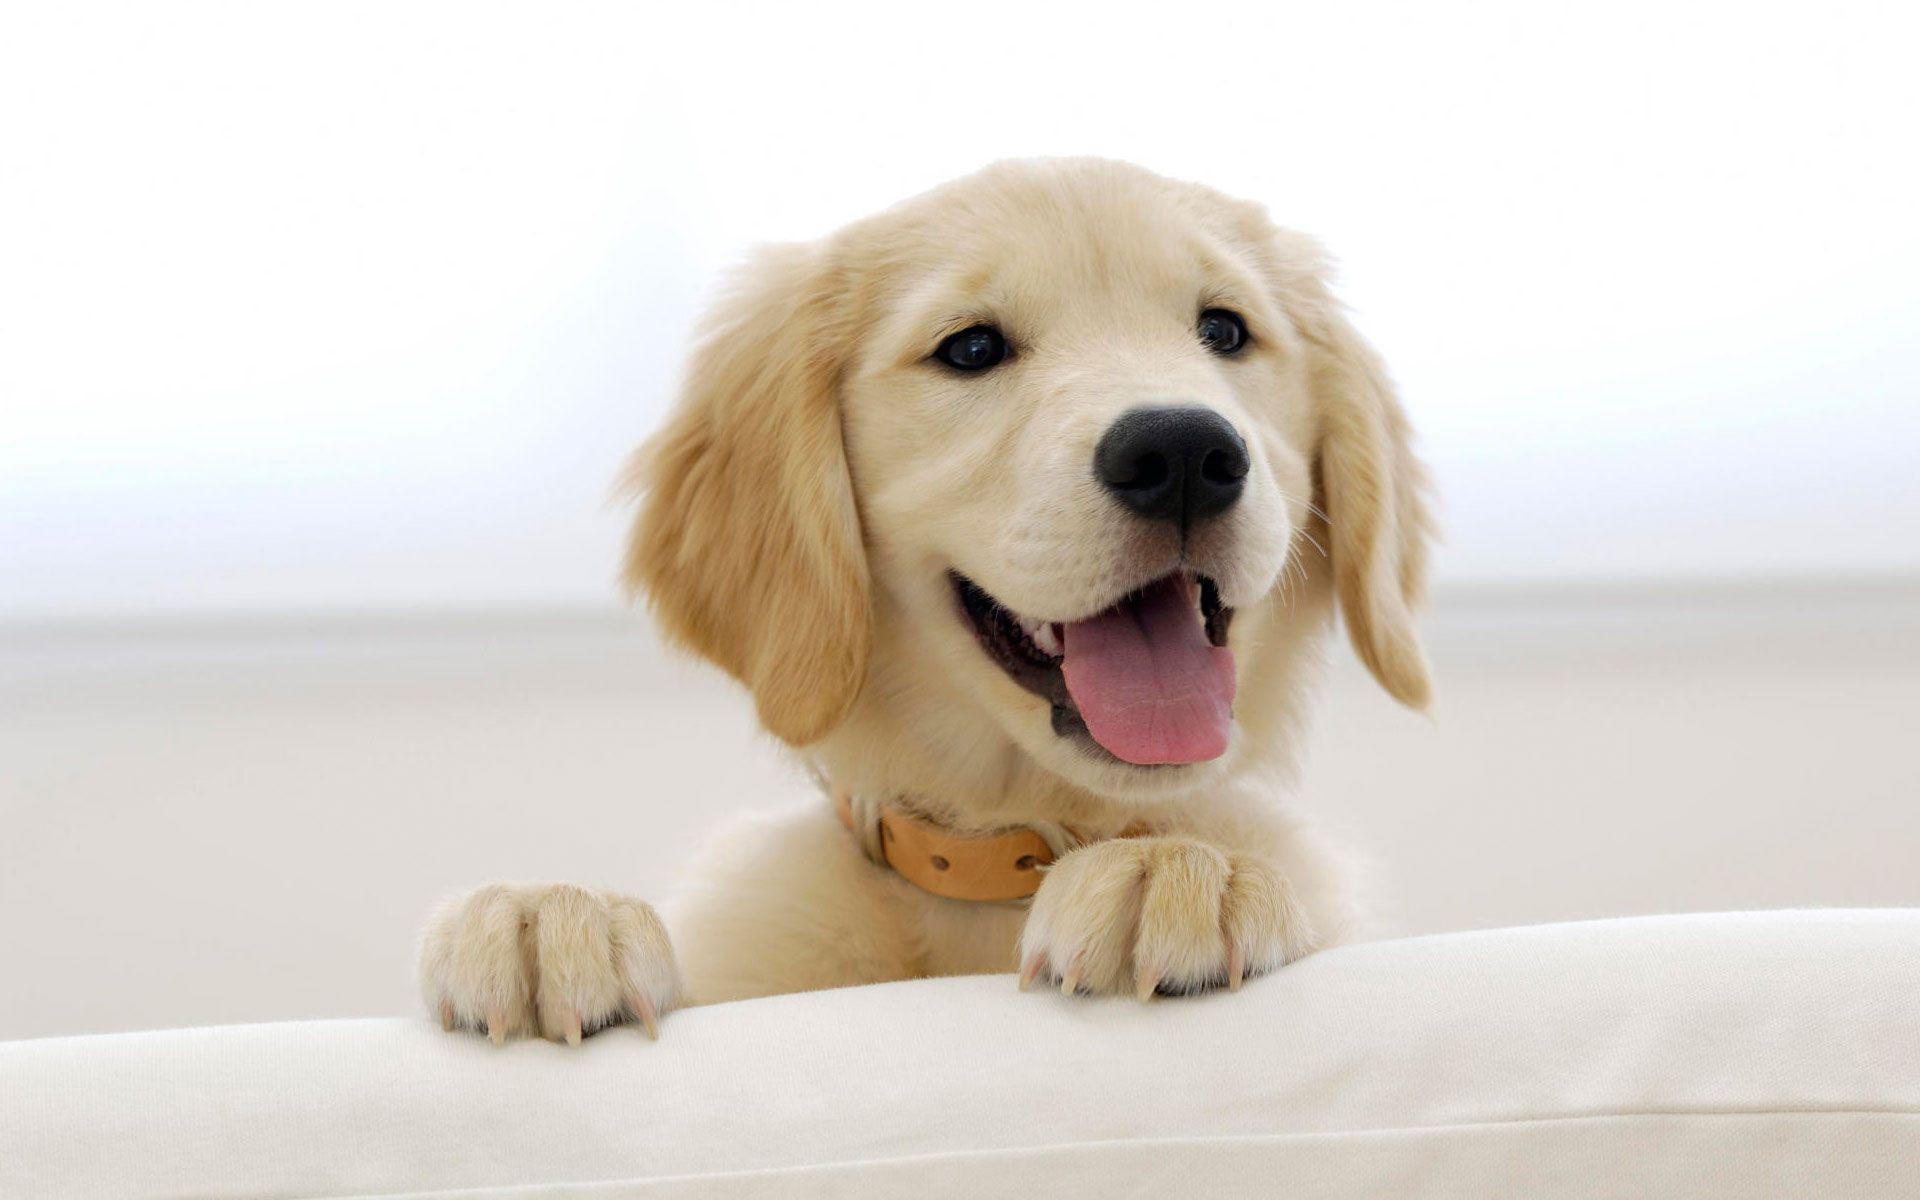 Cute Dog Wallpaper